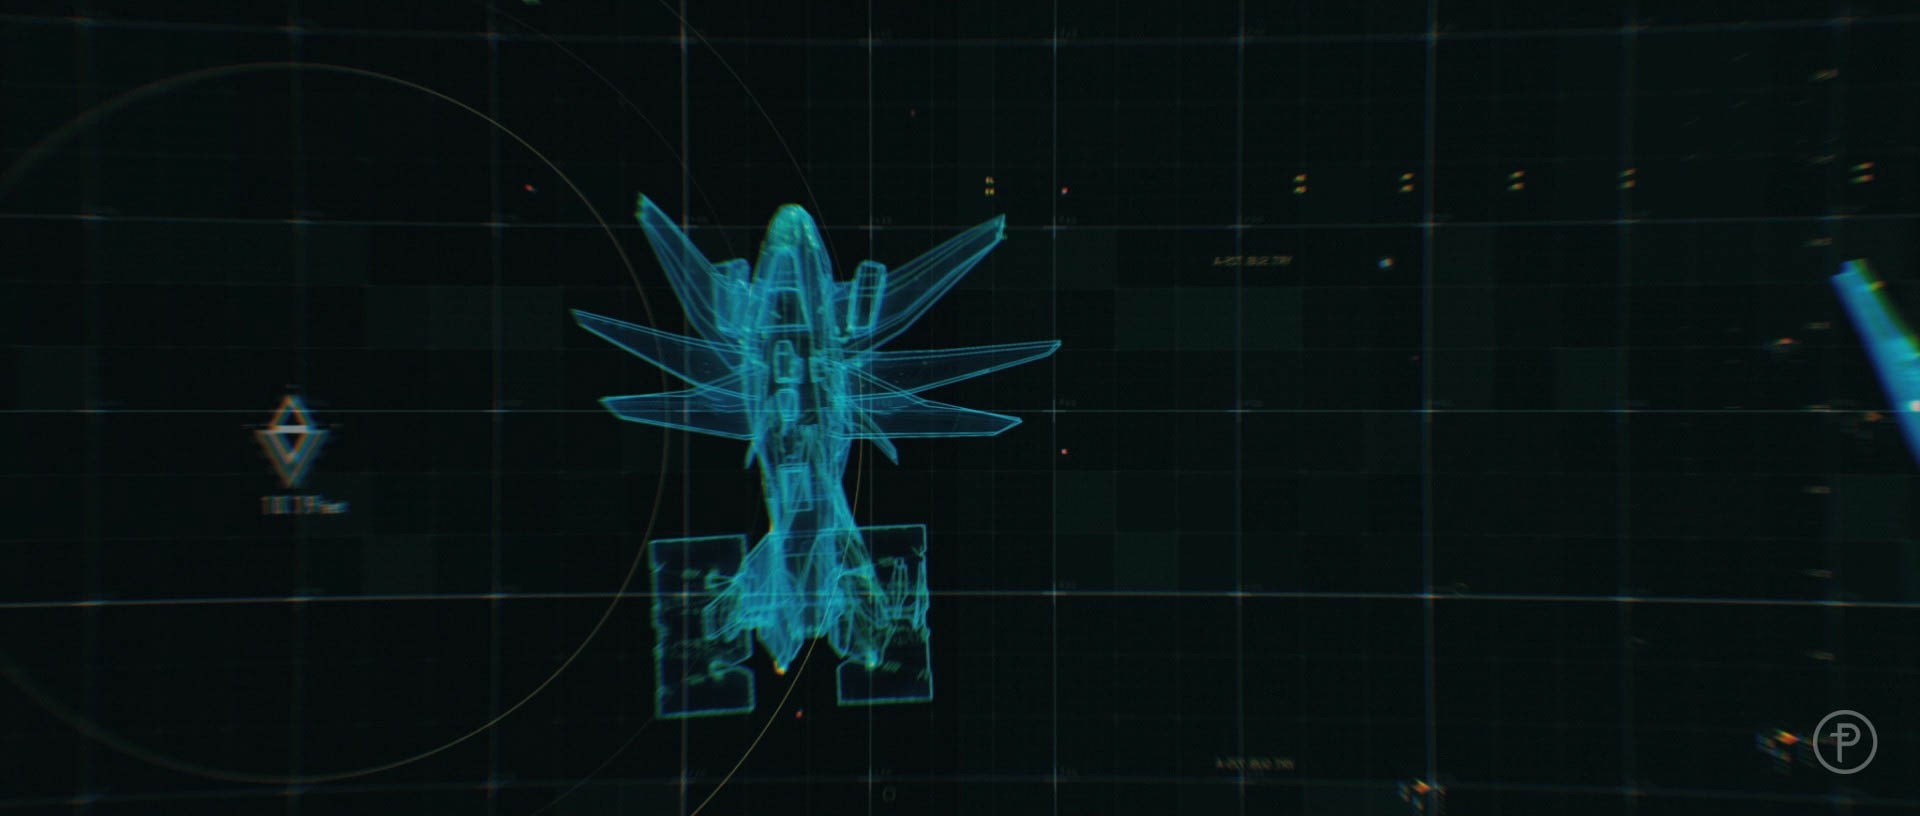 Zai_Ortiz_battleship_-12.jpg